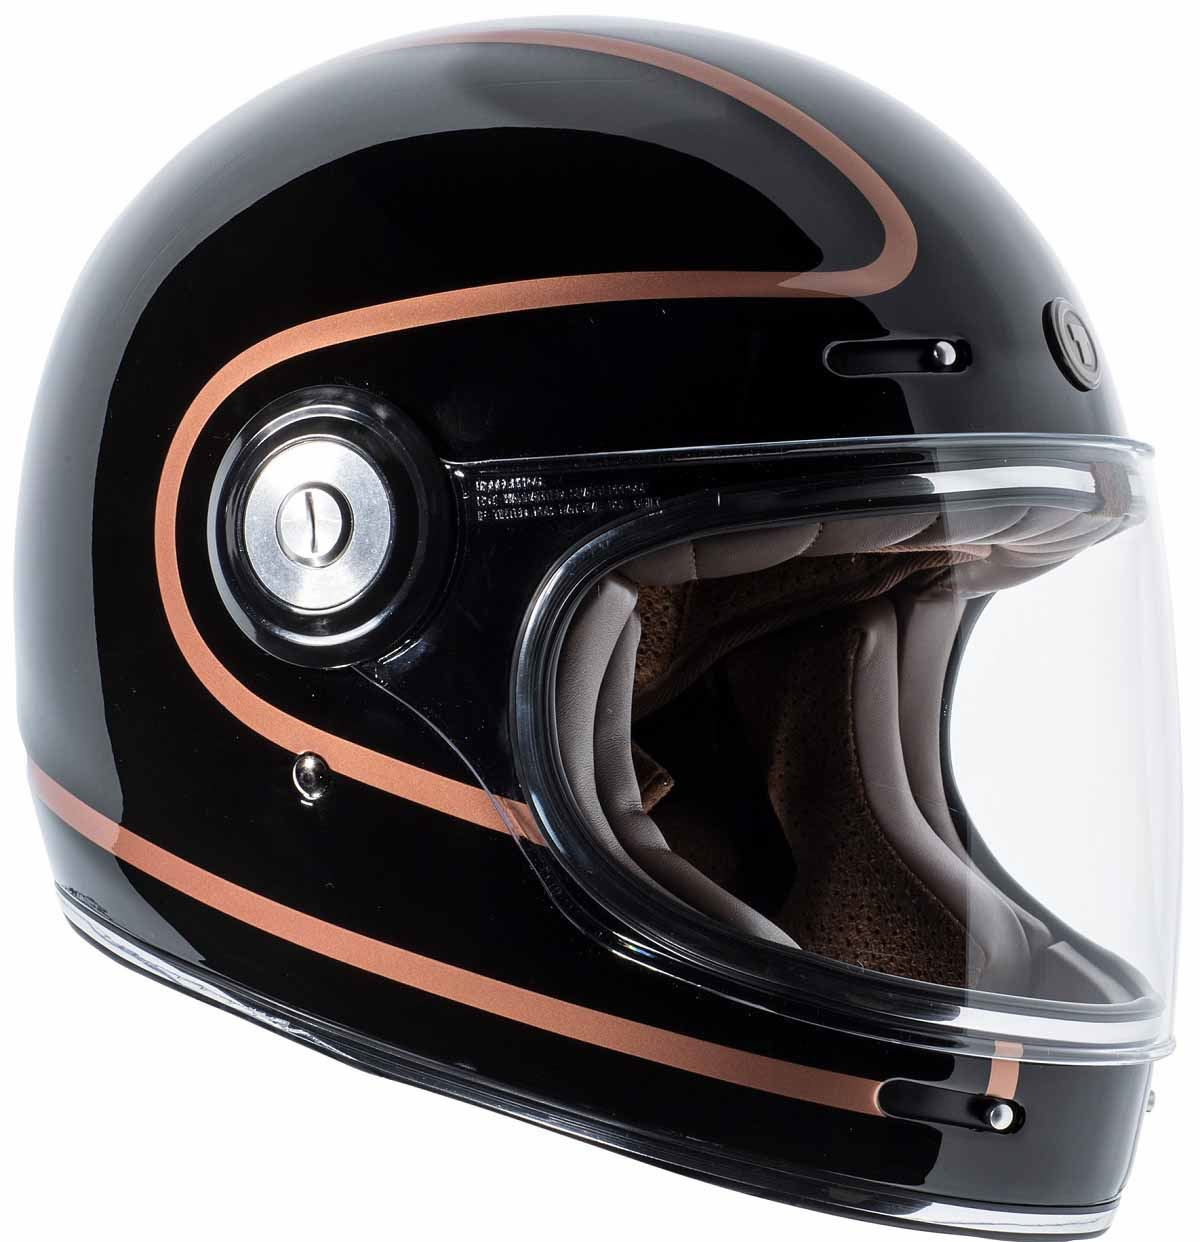 miniature 19 - Torc T1 Helmet Retro Vintage Style Fiberglass DOT Approved XS-2XL